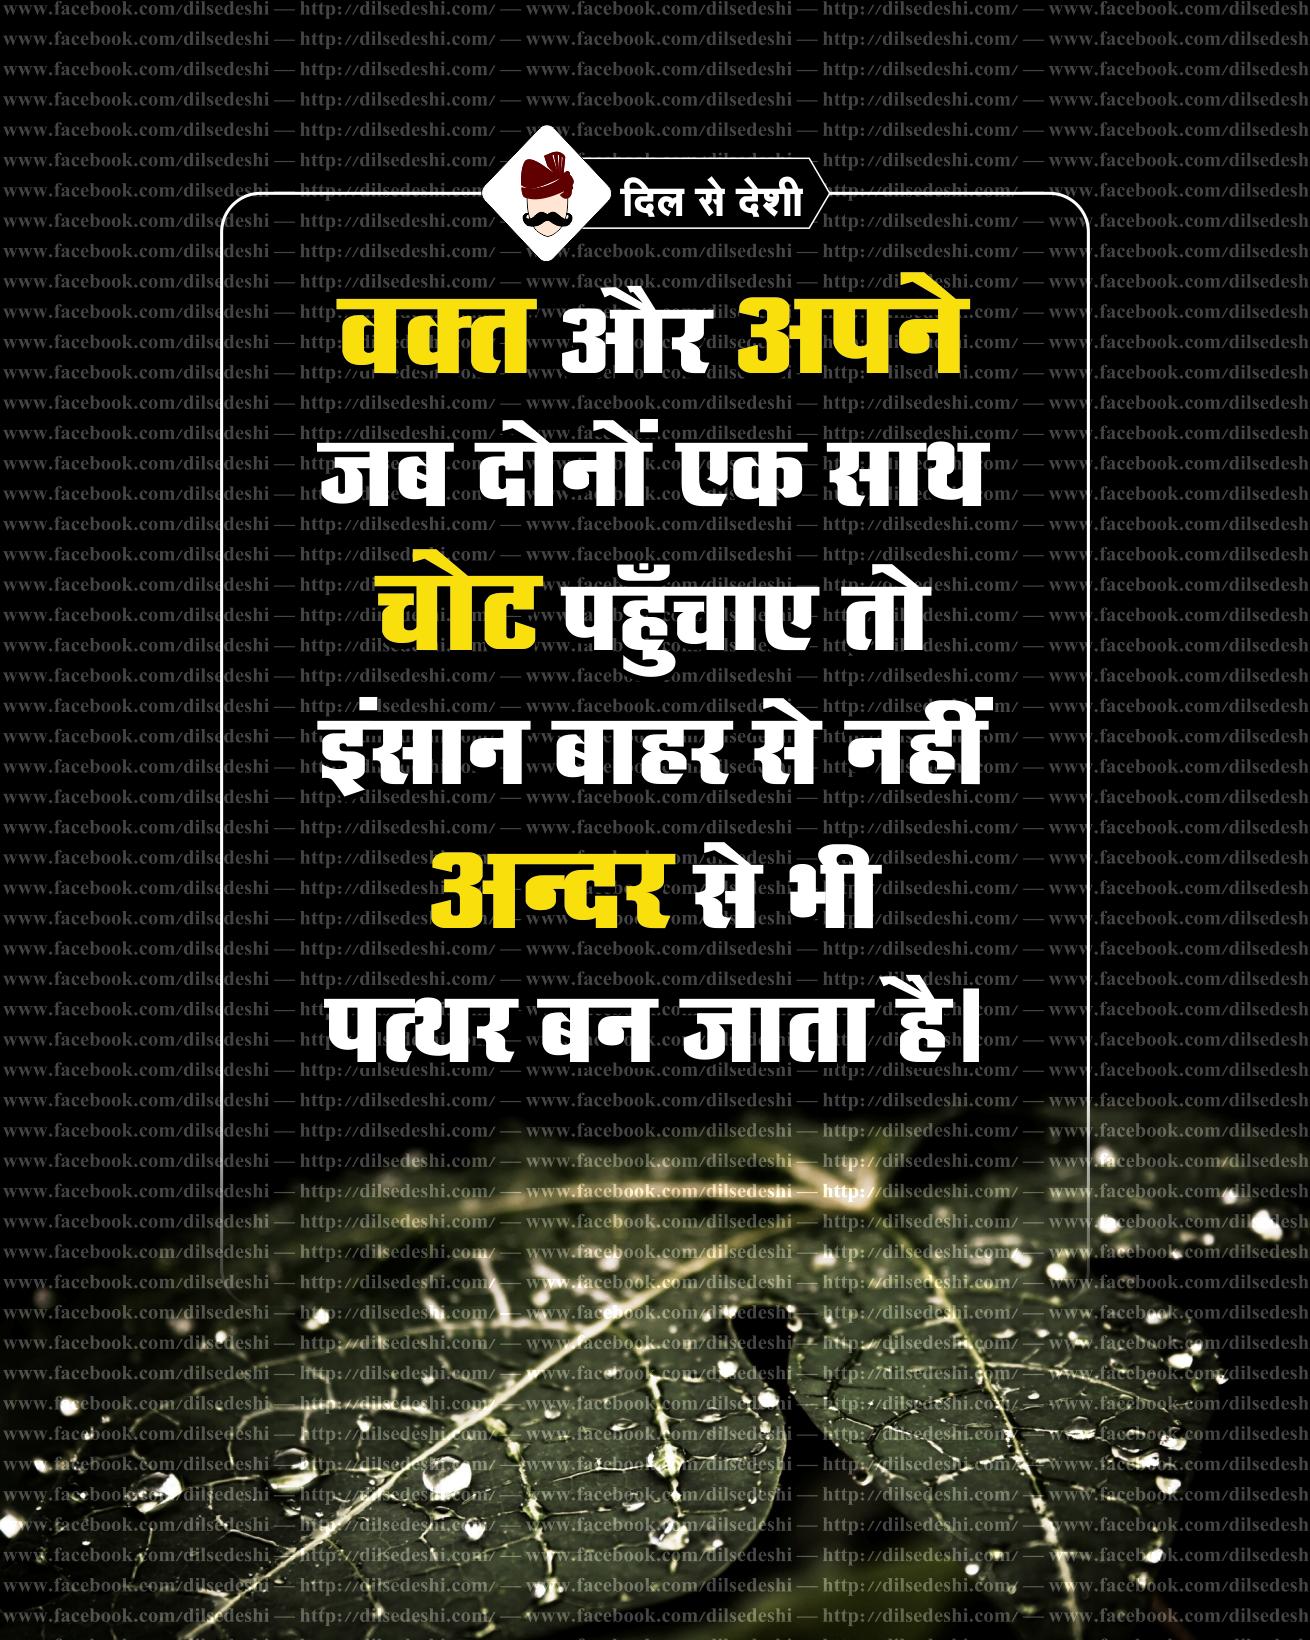 सुविचार | Motivational quotes in hindi, Hindi quotes, Life ...